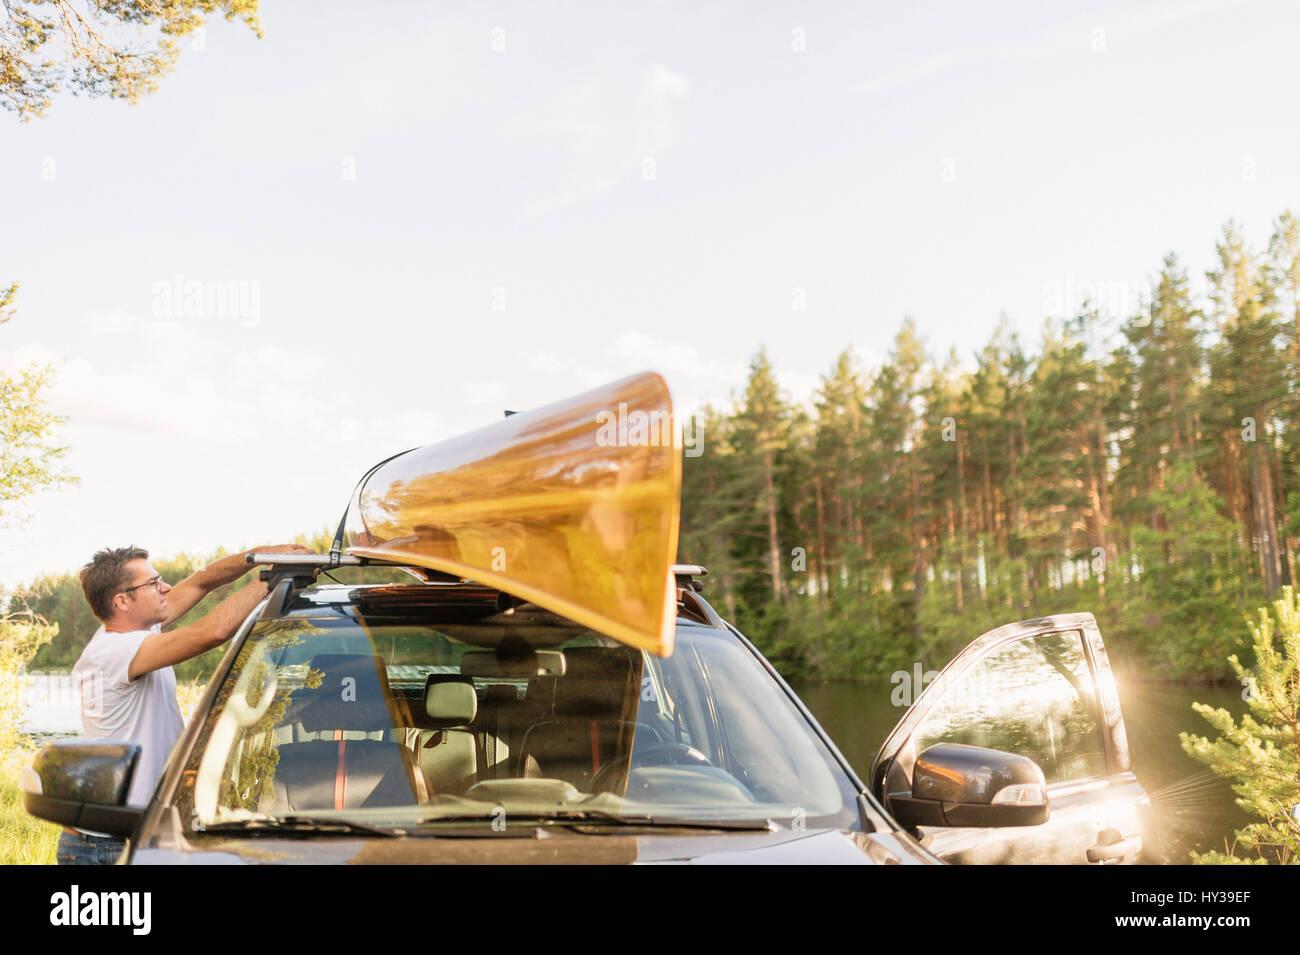 La Svezia, vastmanland, hallefors, bergslagen, man standing in auto con kayak sul tetto Immagini Stock